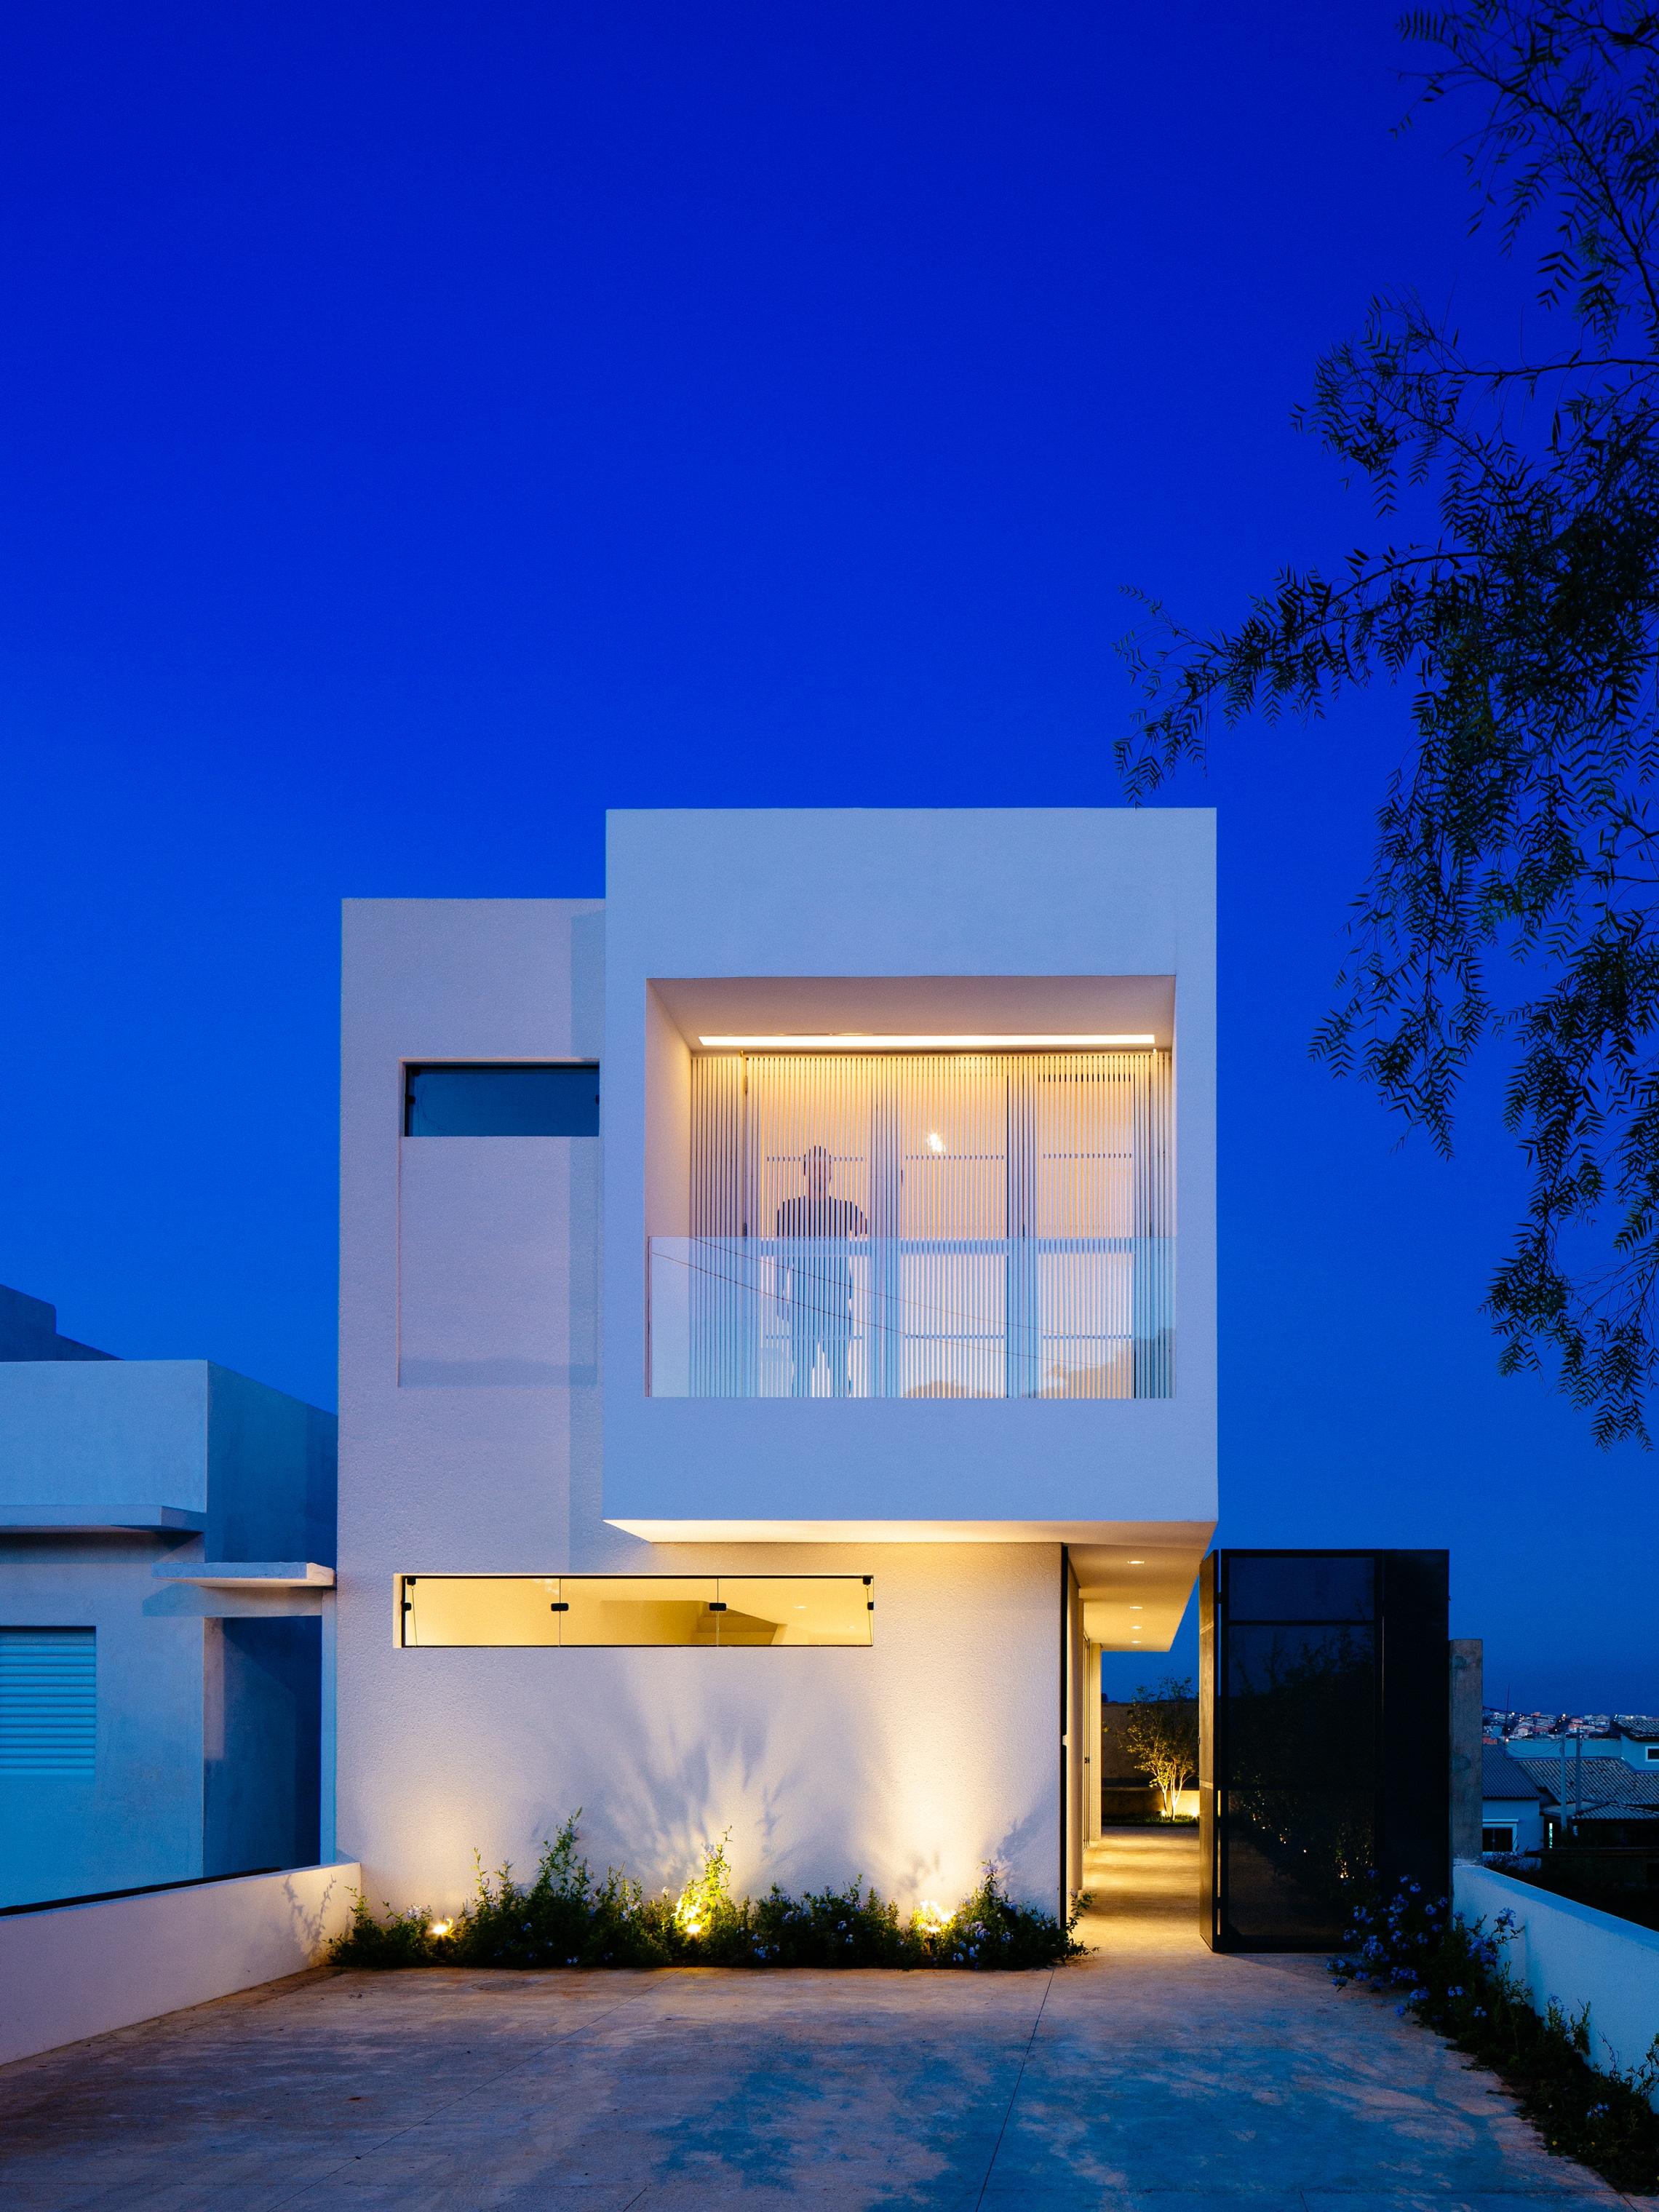 Sencilla casa de dos pisos con planos y dise o de interiores for Casa modelo minimalista